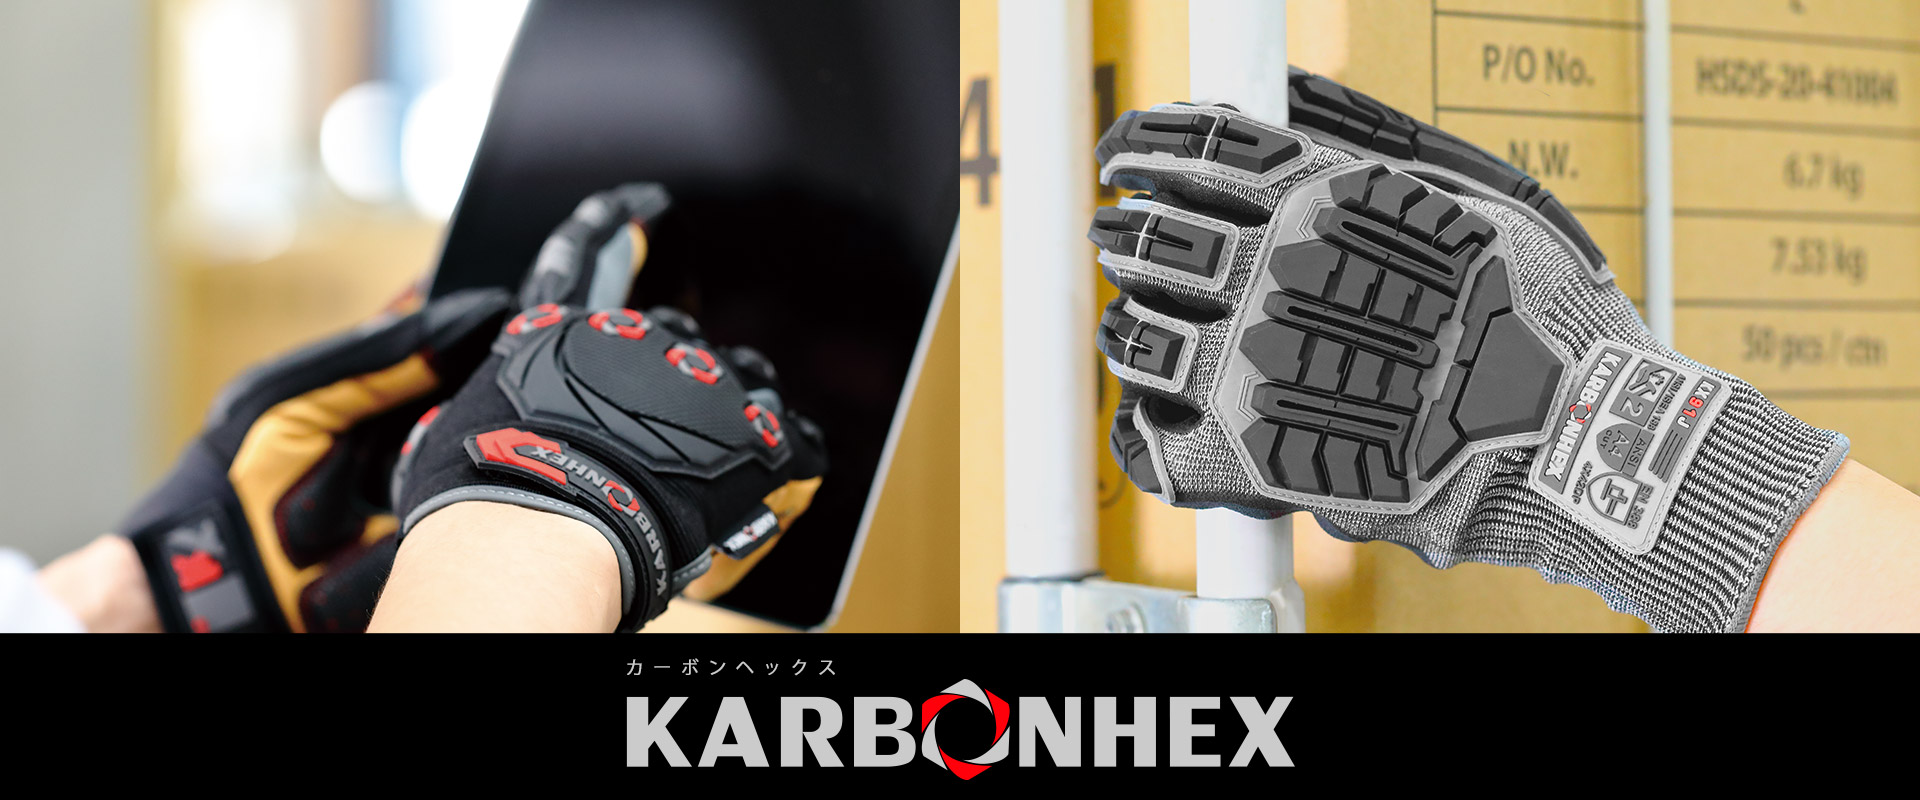 KARBONHEX カーボンヘックス